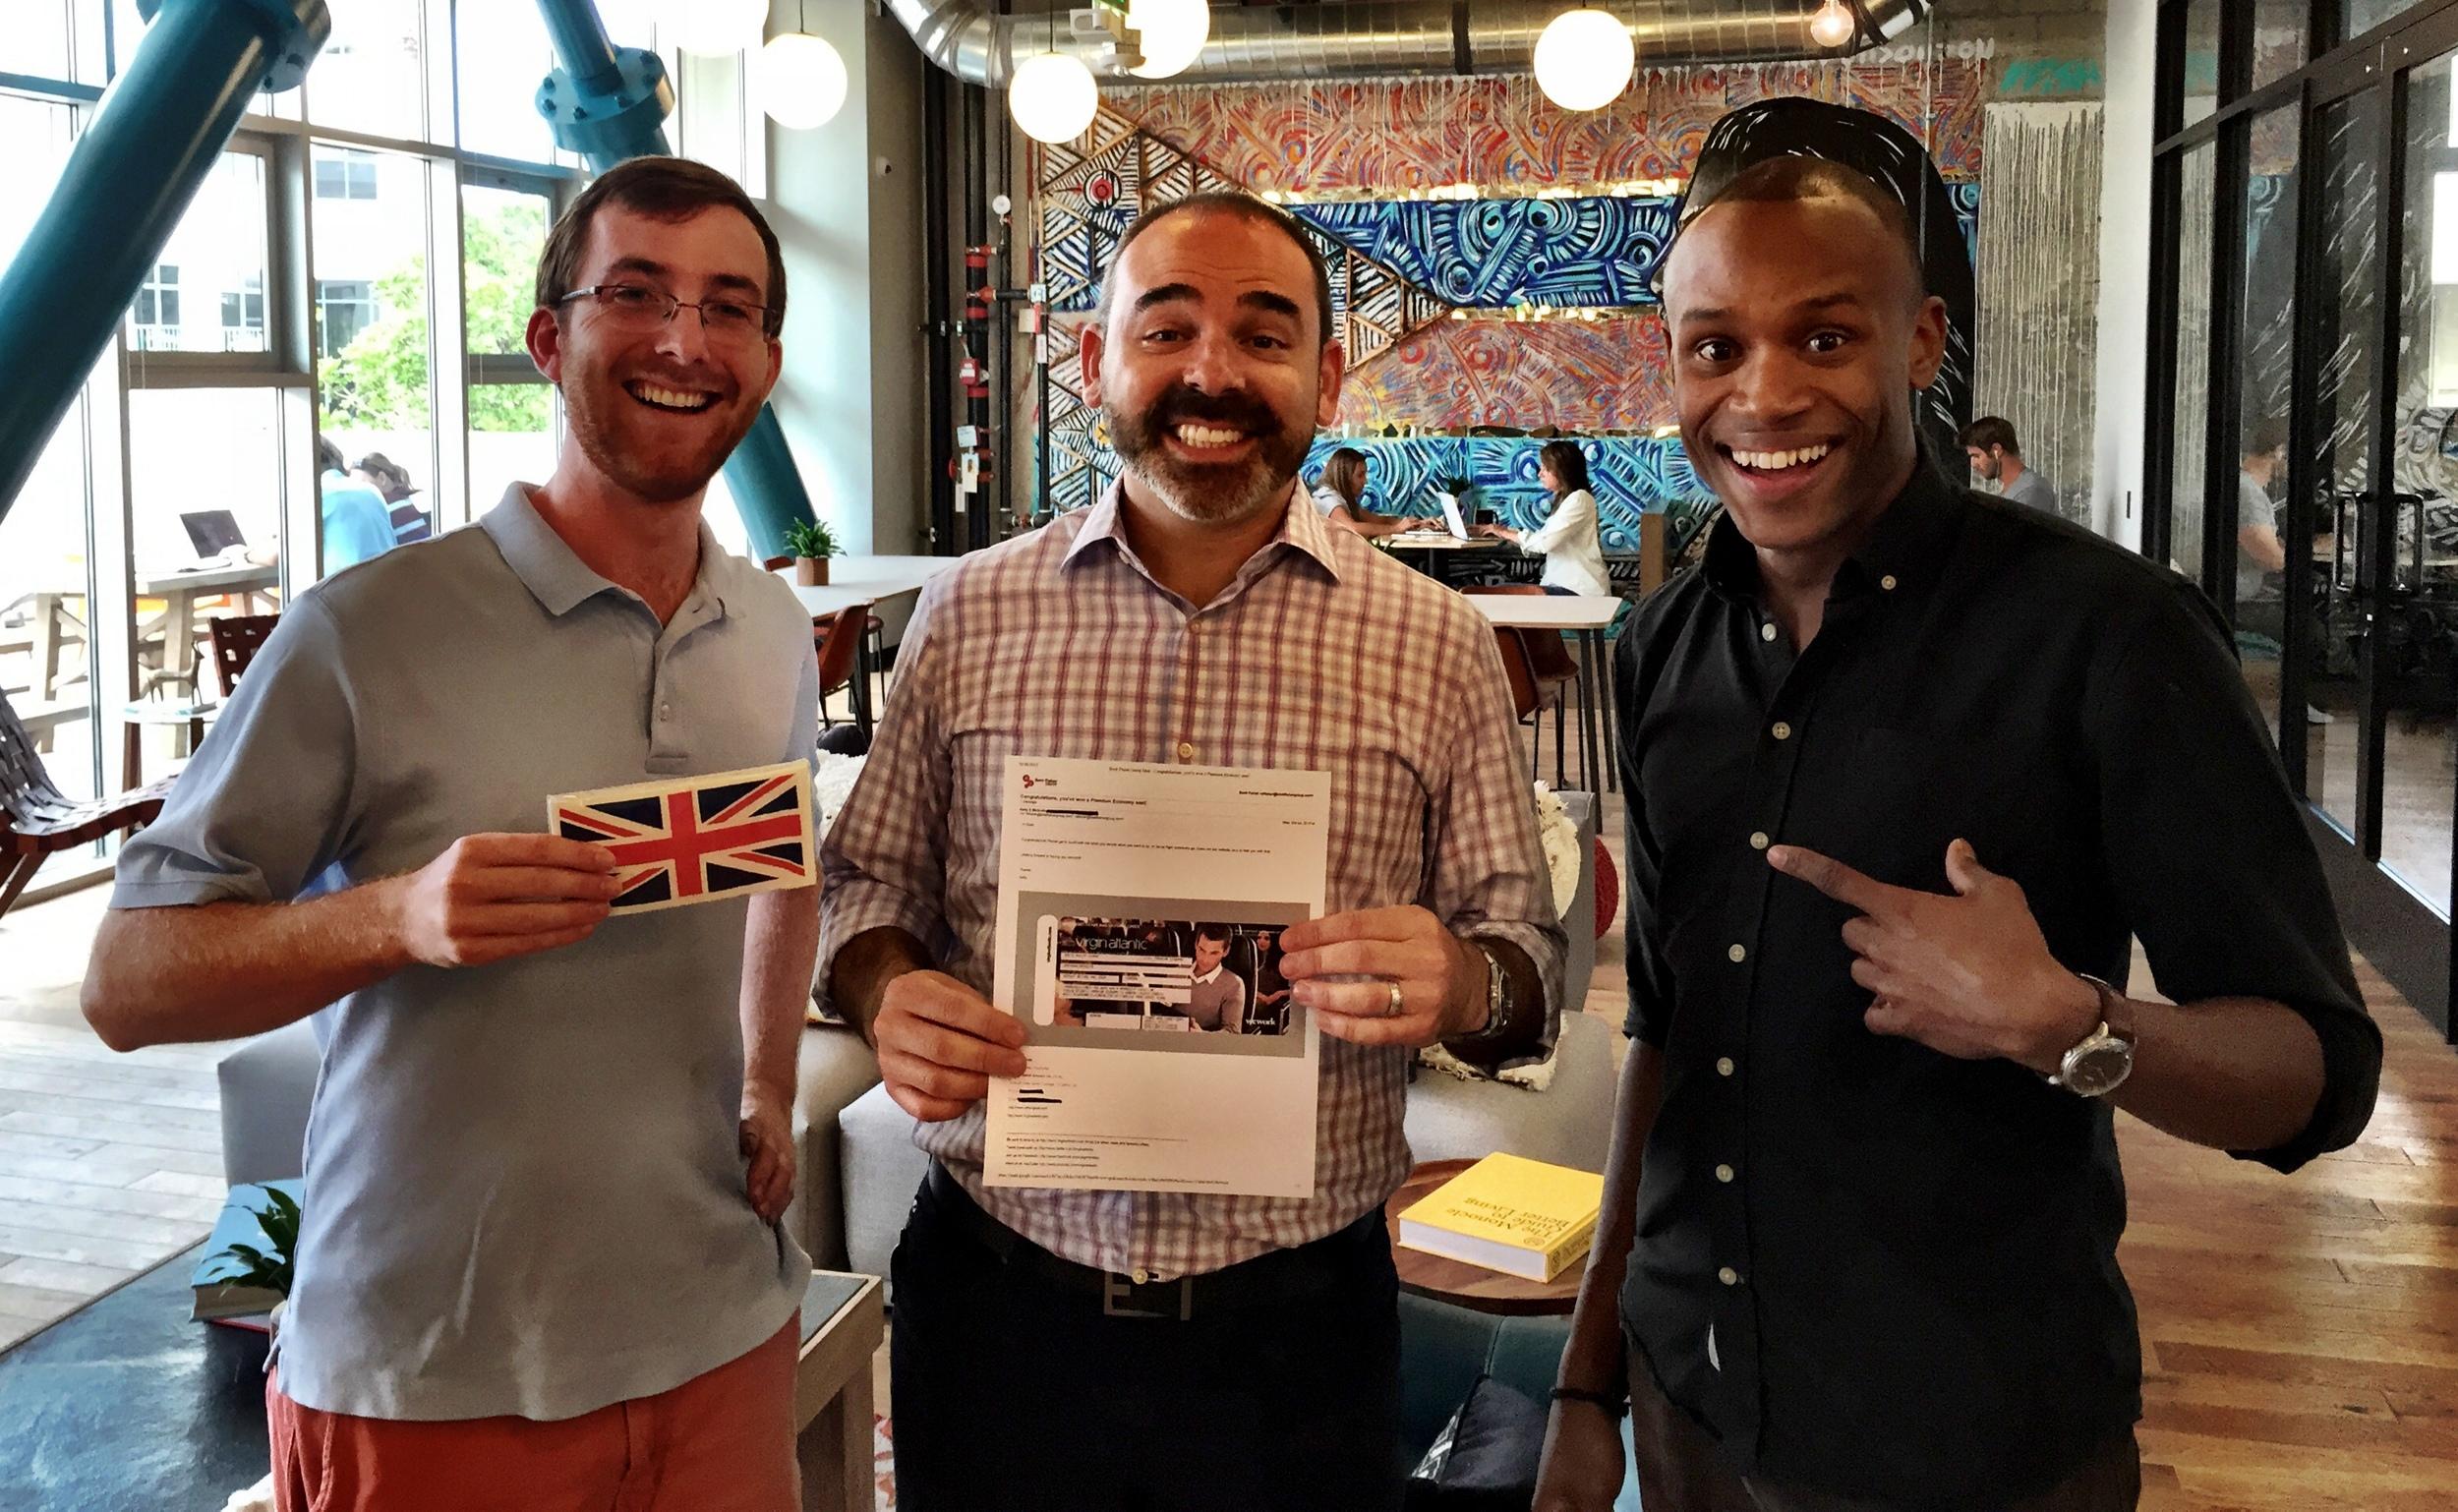 Brendan and Brett with WeWork Promenade Community Manager Matthew Jones.